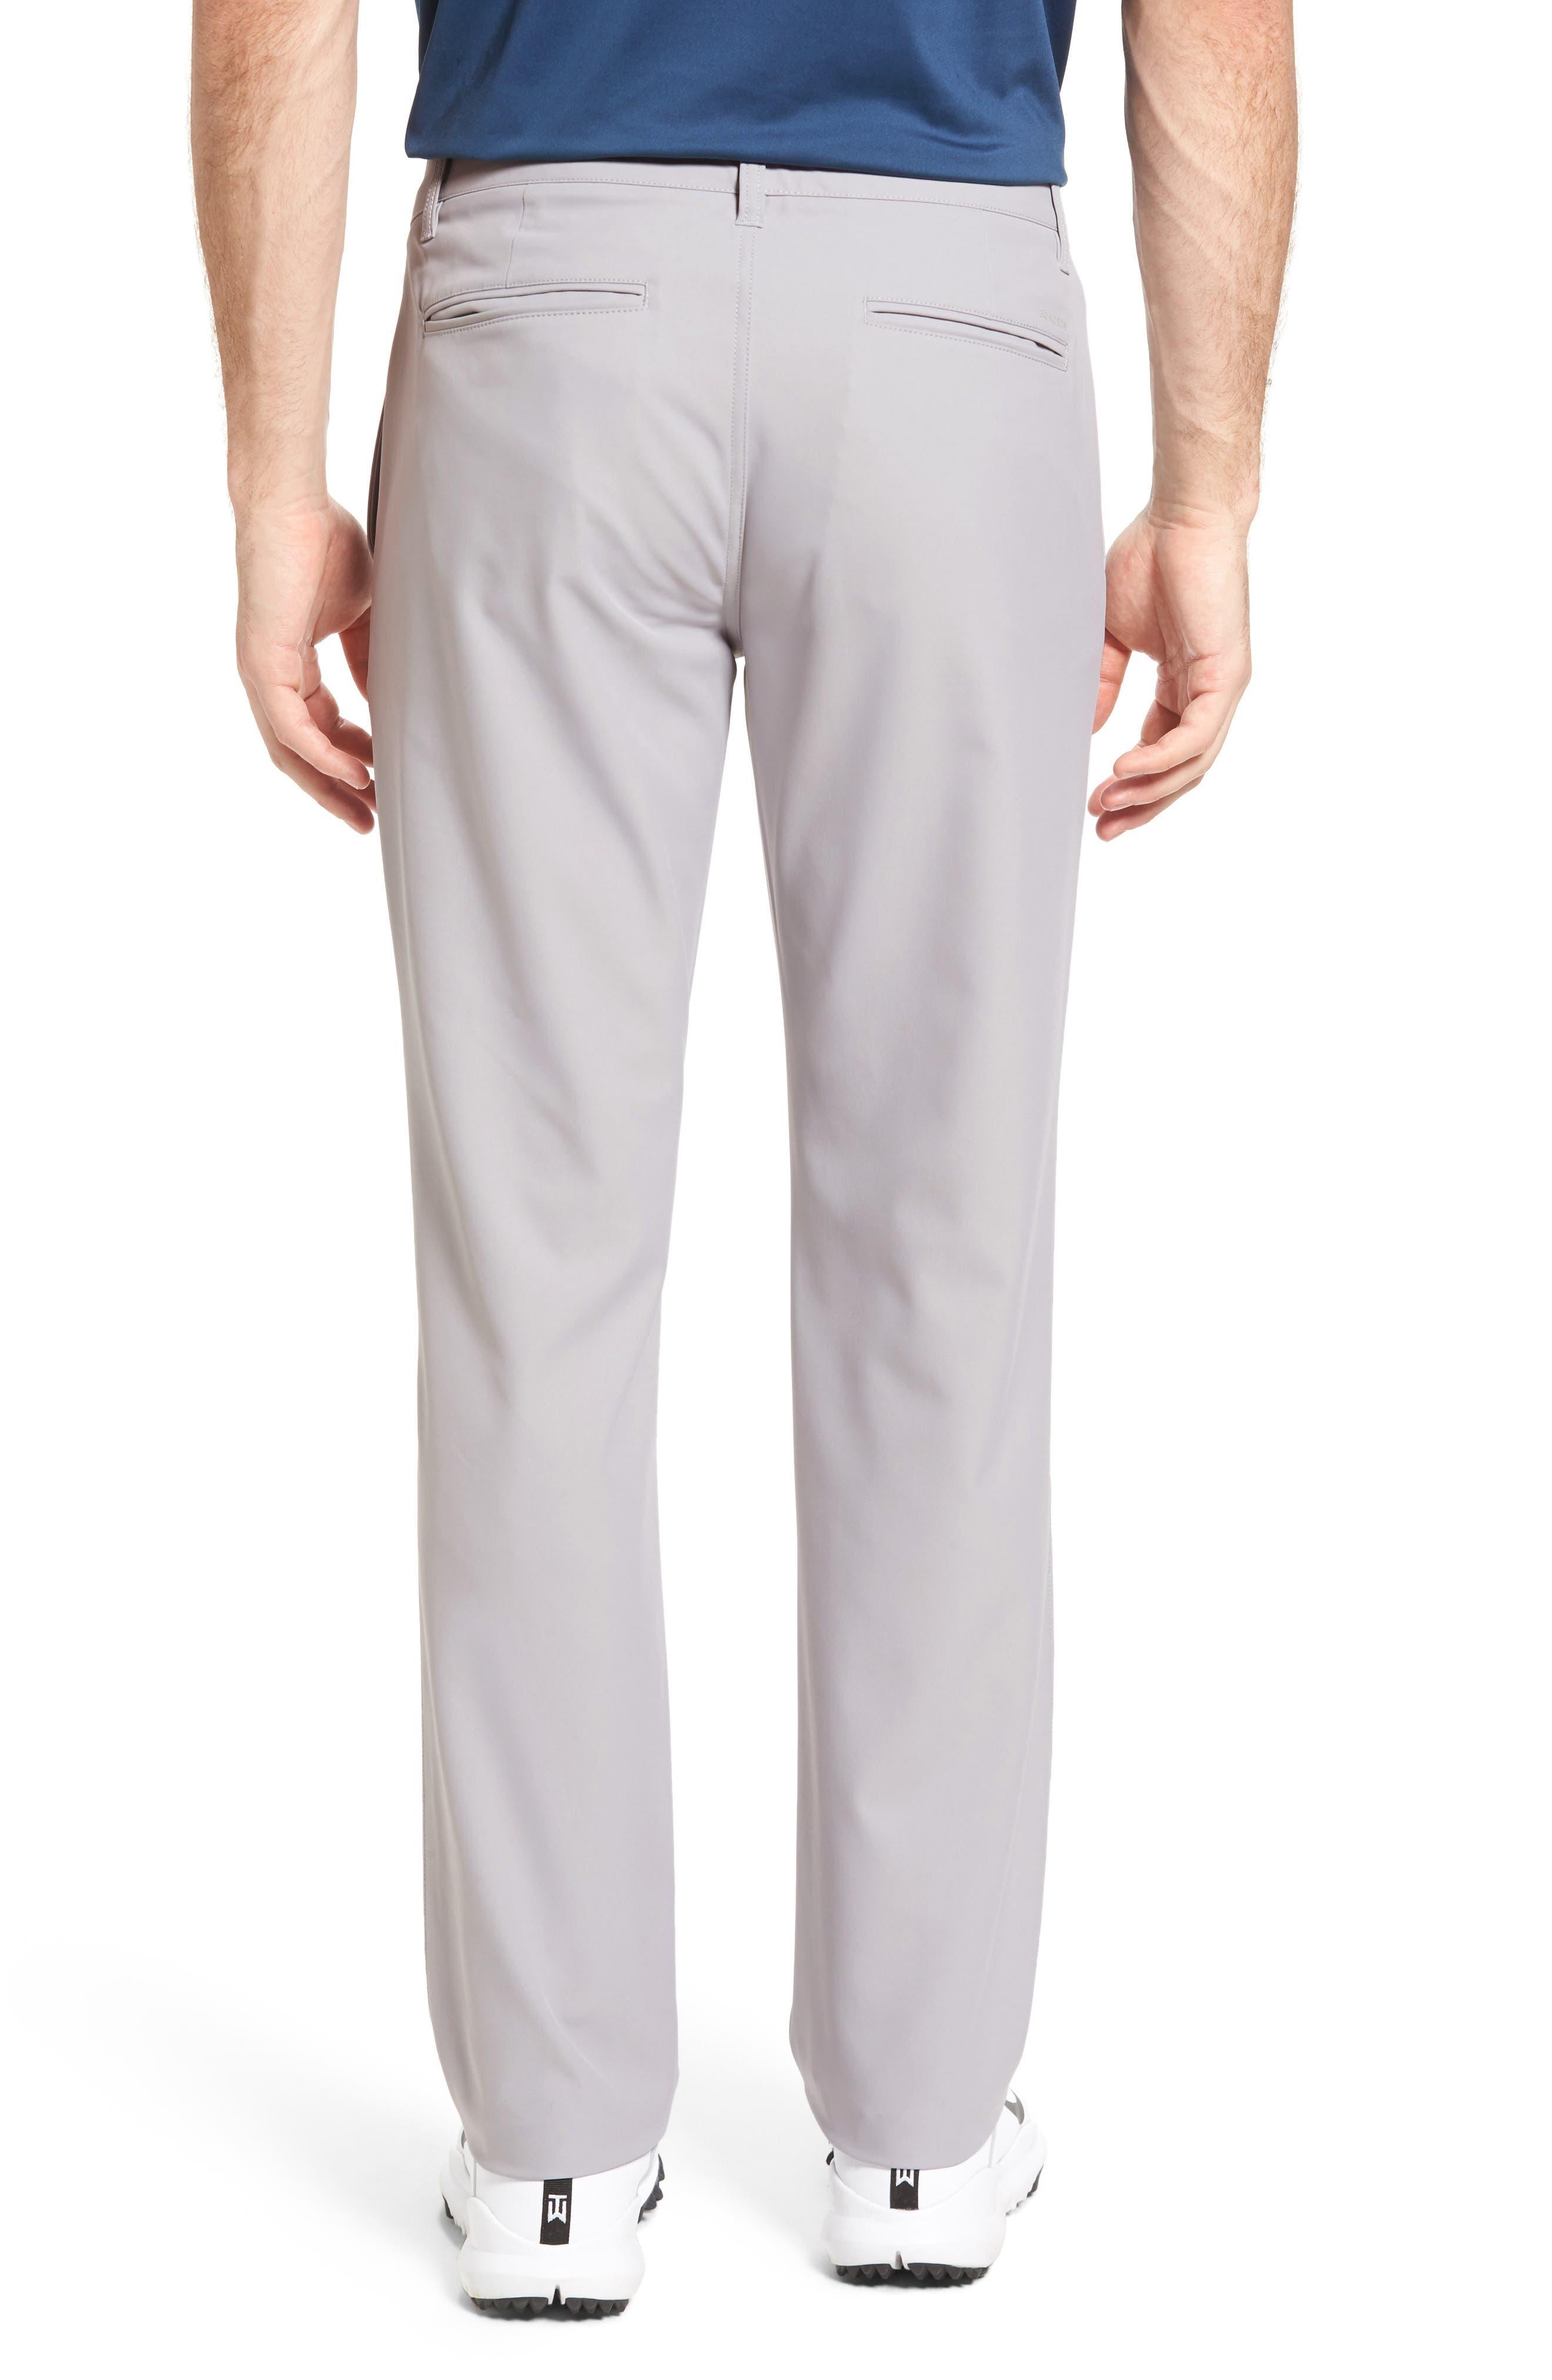 Highland Slim Fit Golf Pants,                             Alternate thumbnail 2, color,                             LIGHT GREY